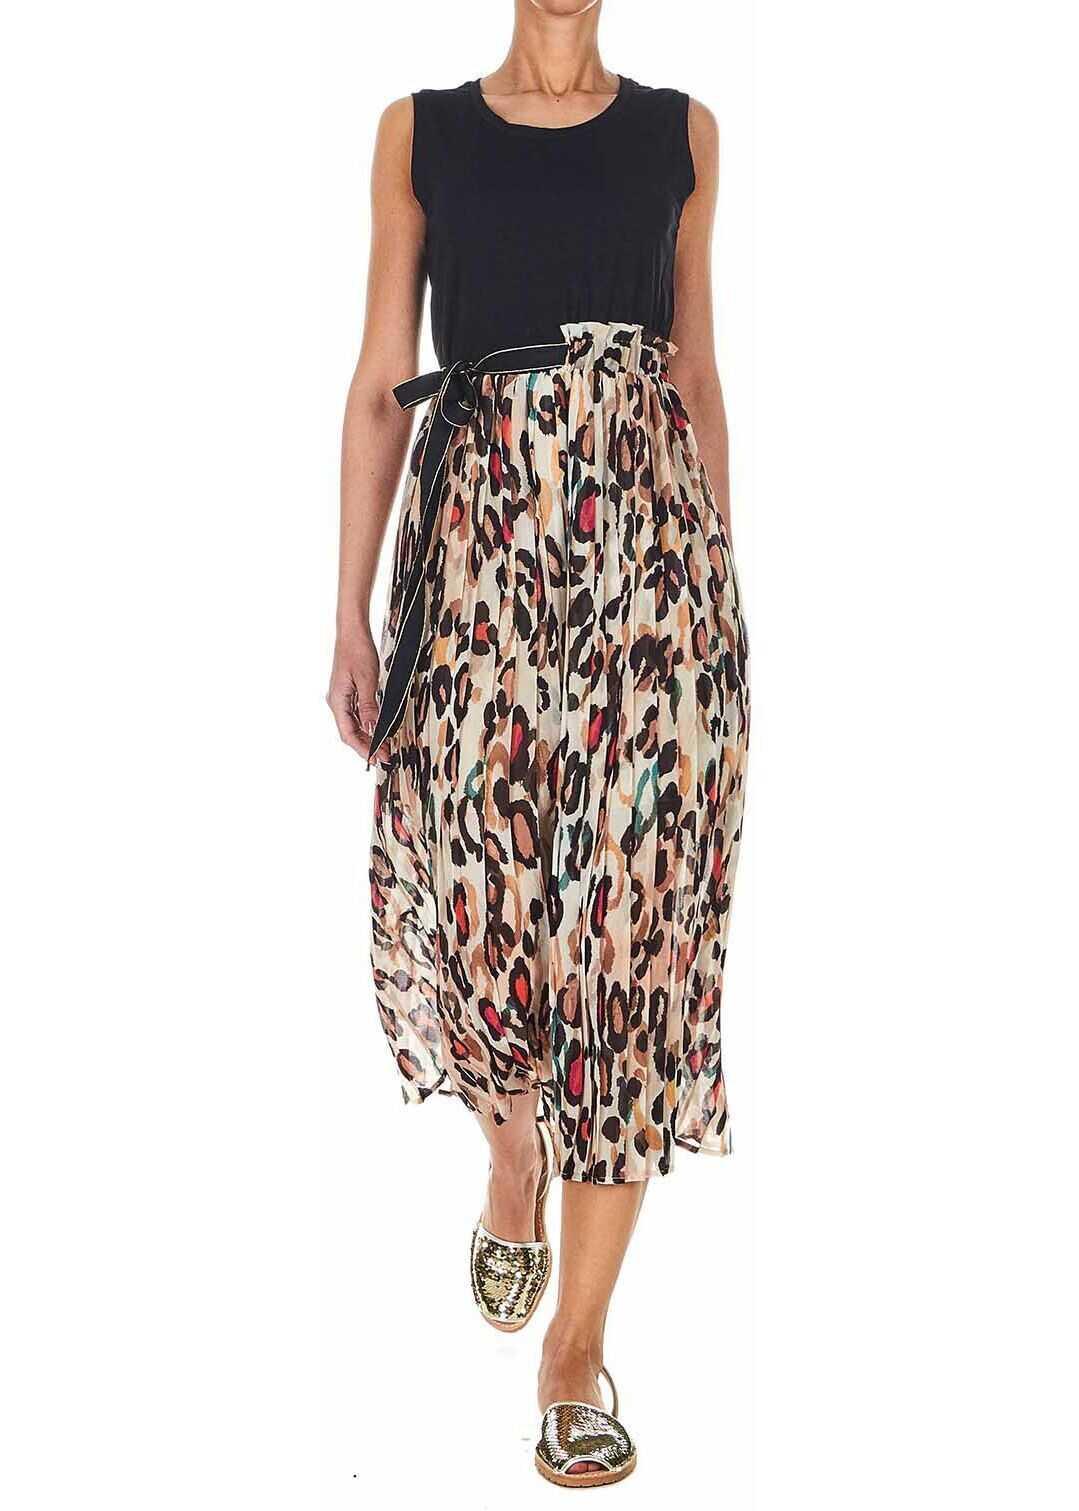 Liu Jo Accordion dress with floral print Black